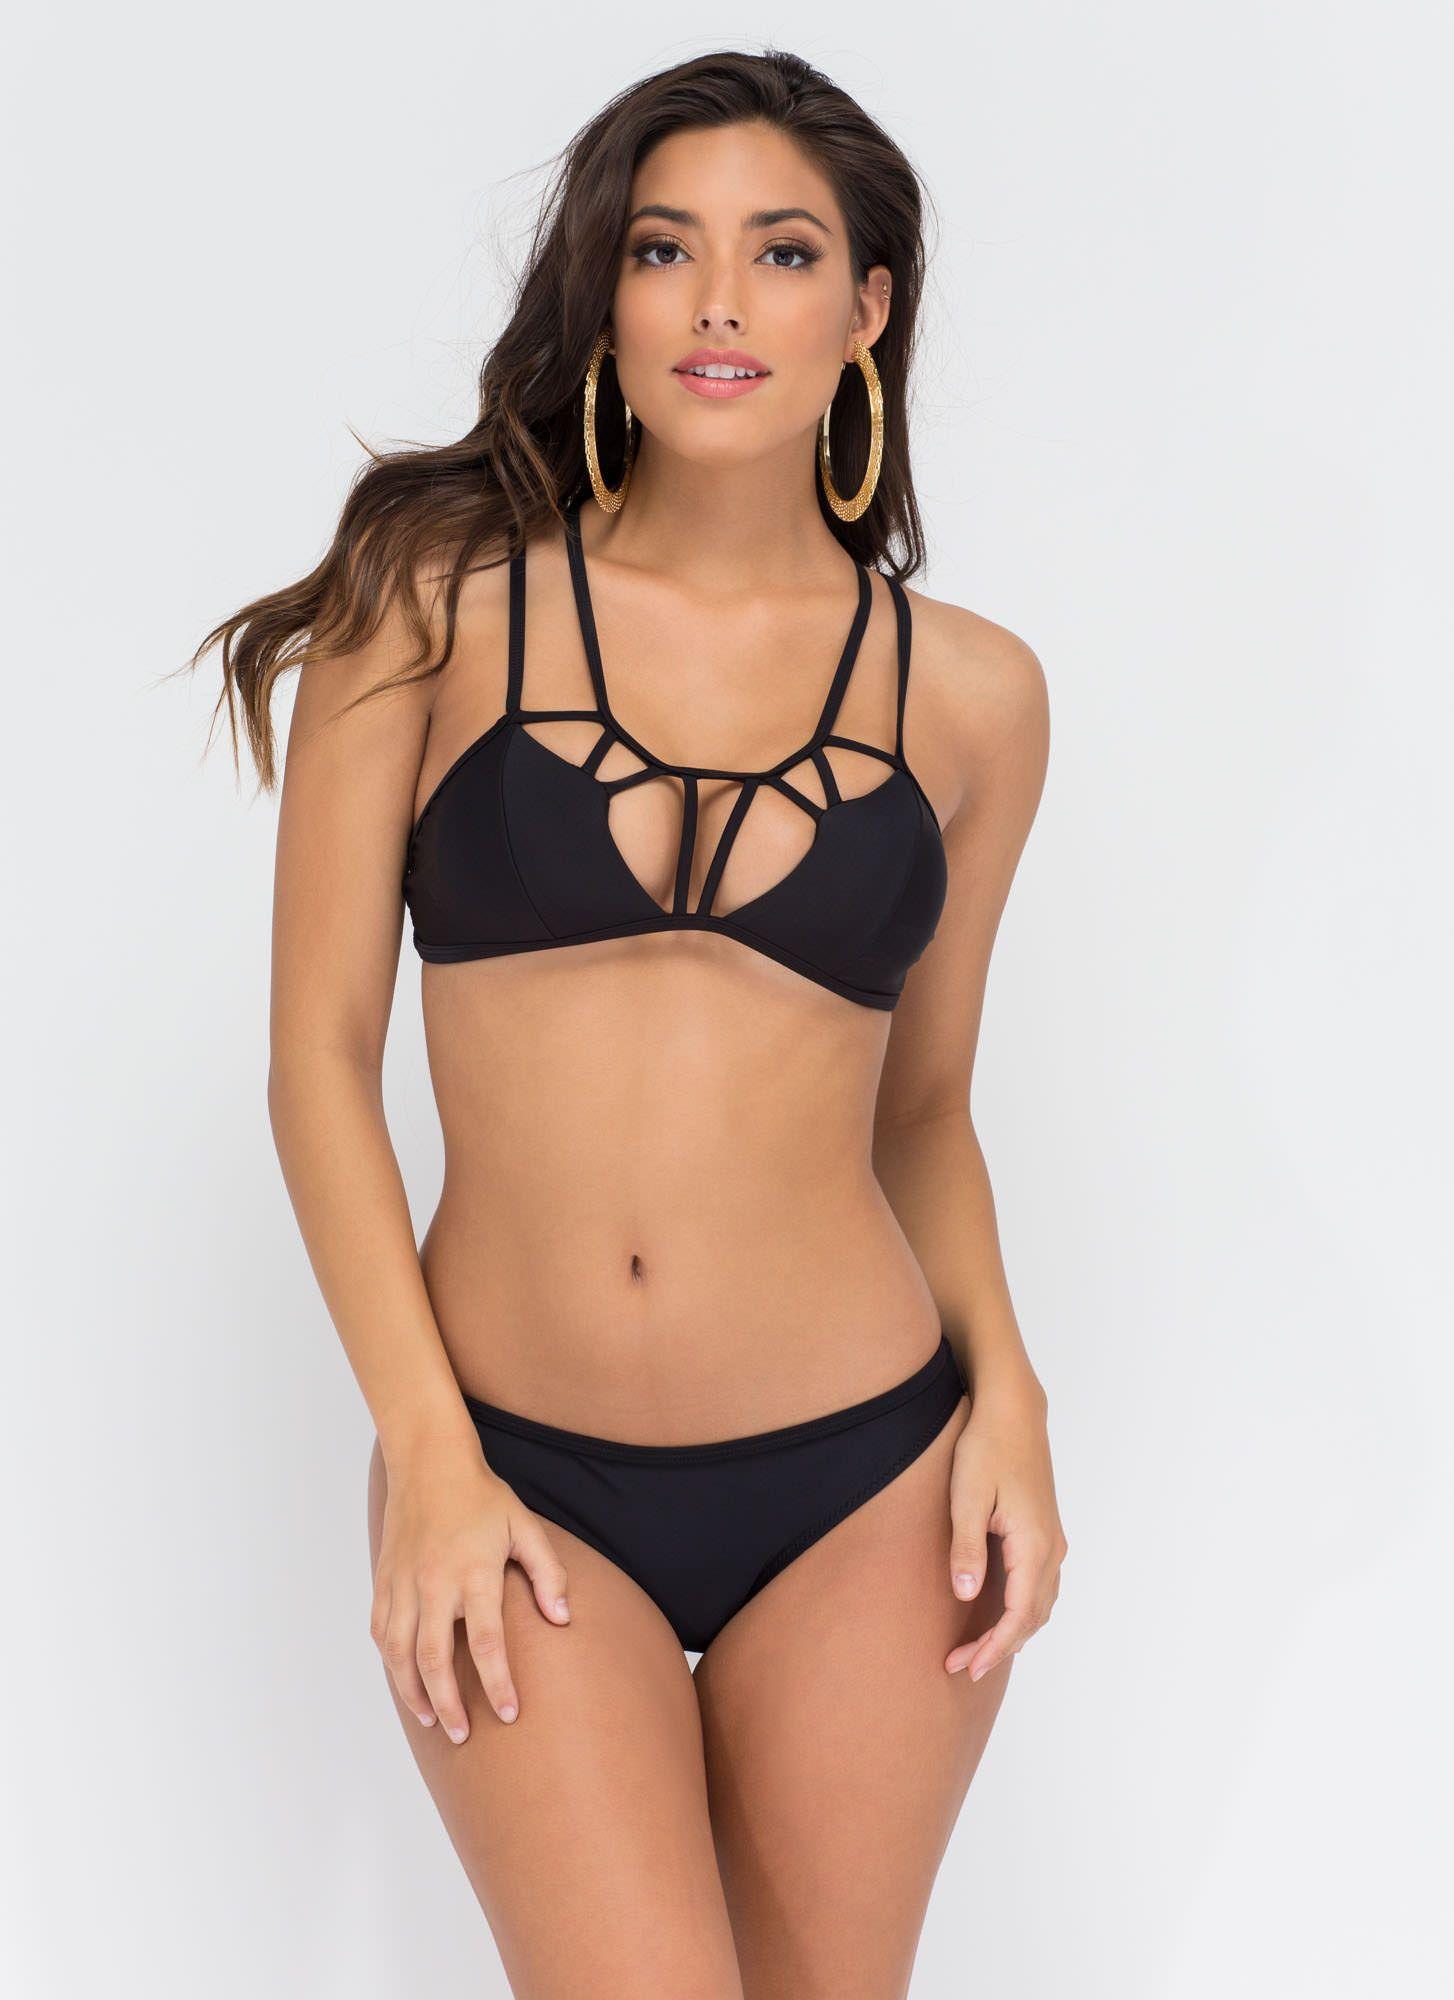 fb544db2df5 Crossed Off Strappy Caged Bikini Set   Babes - # ⚀